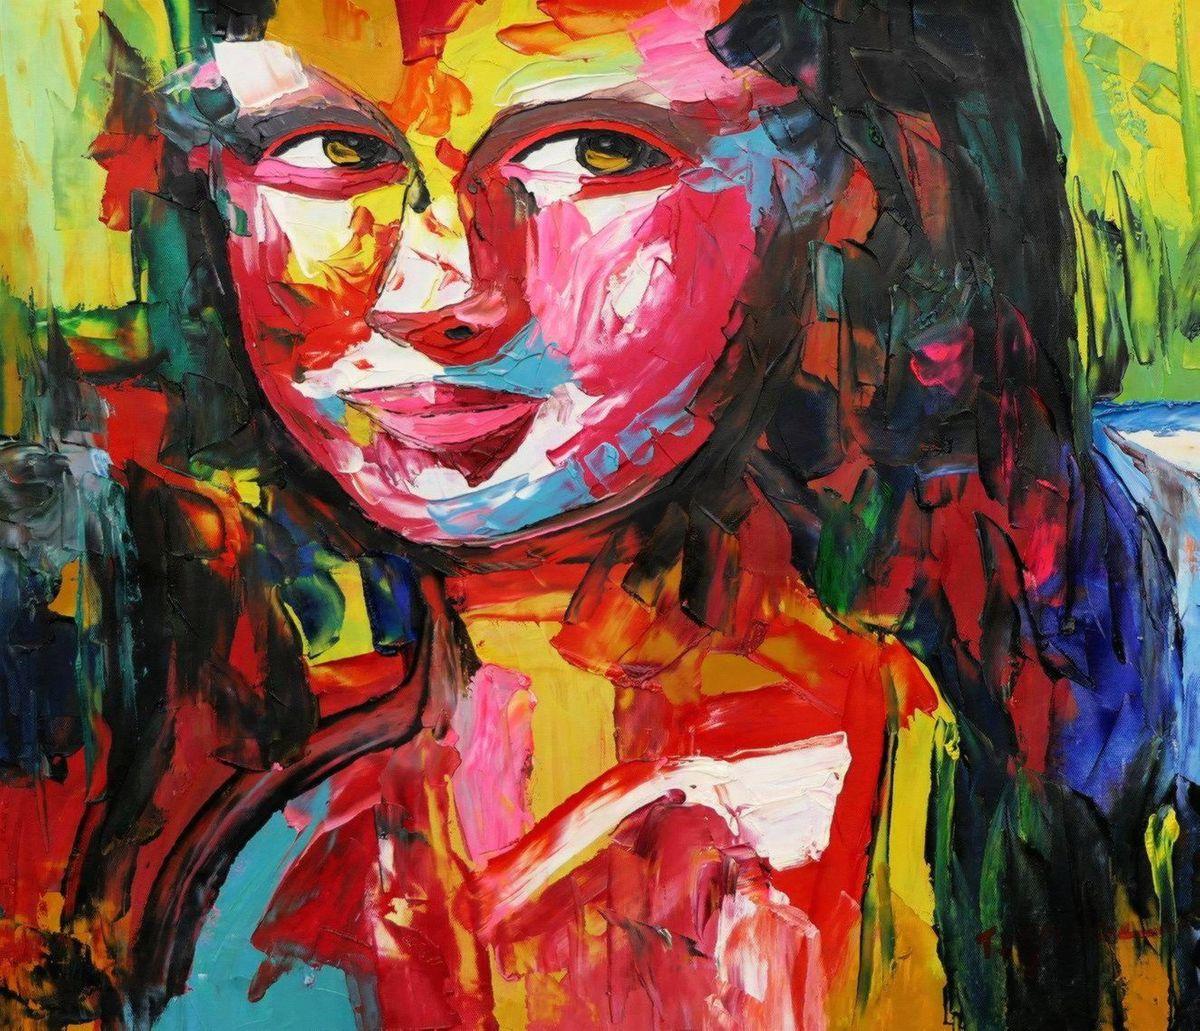 Modern Art - Mona Lisa c97025 50x60cm exquisites Ölbild